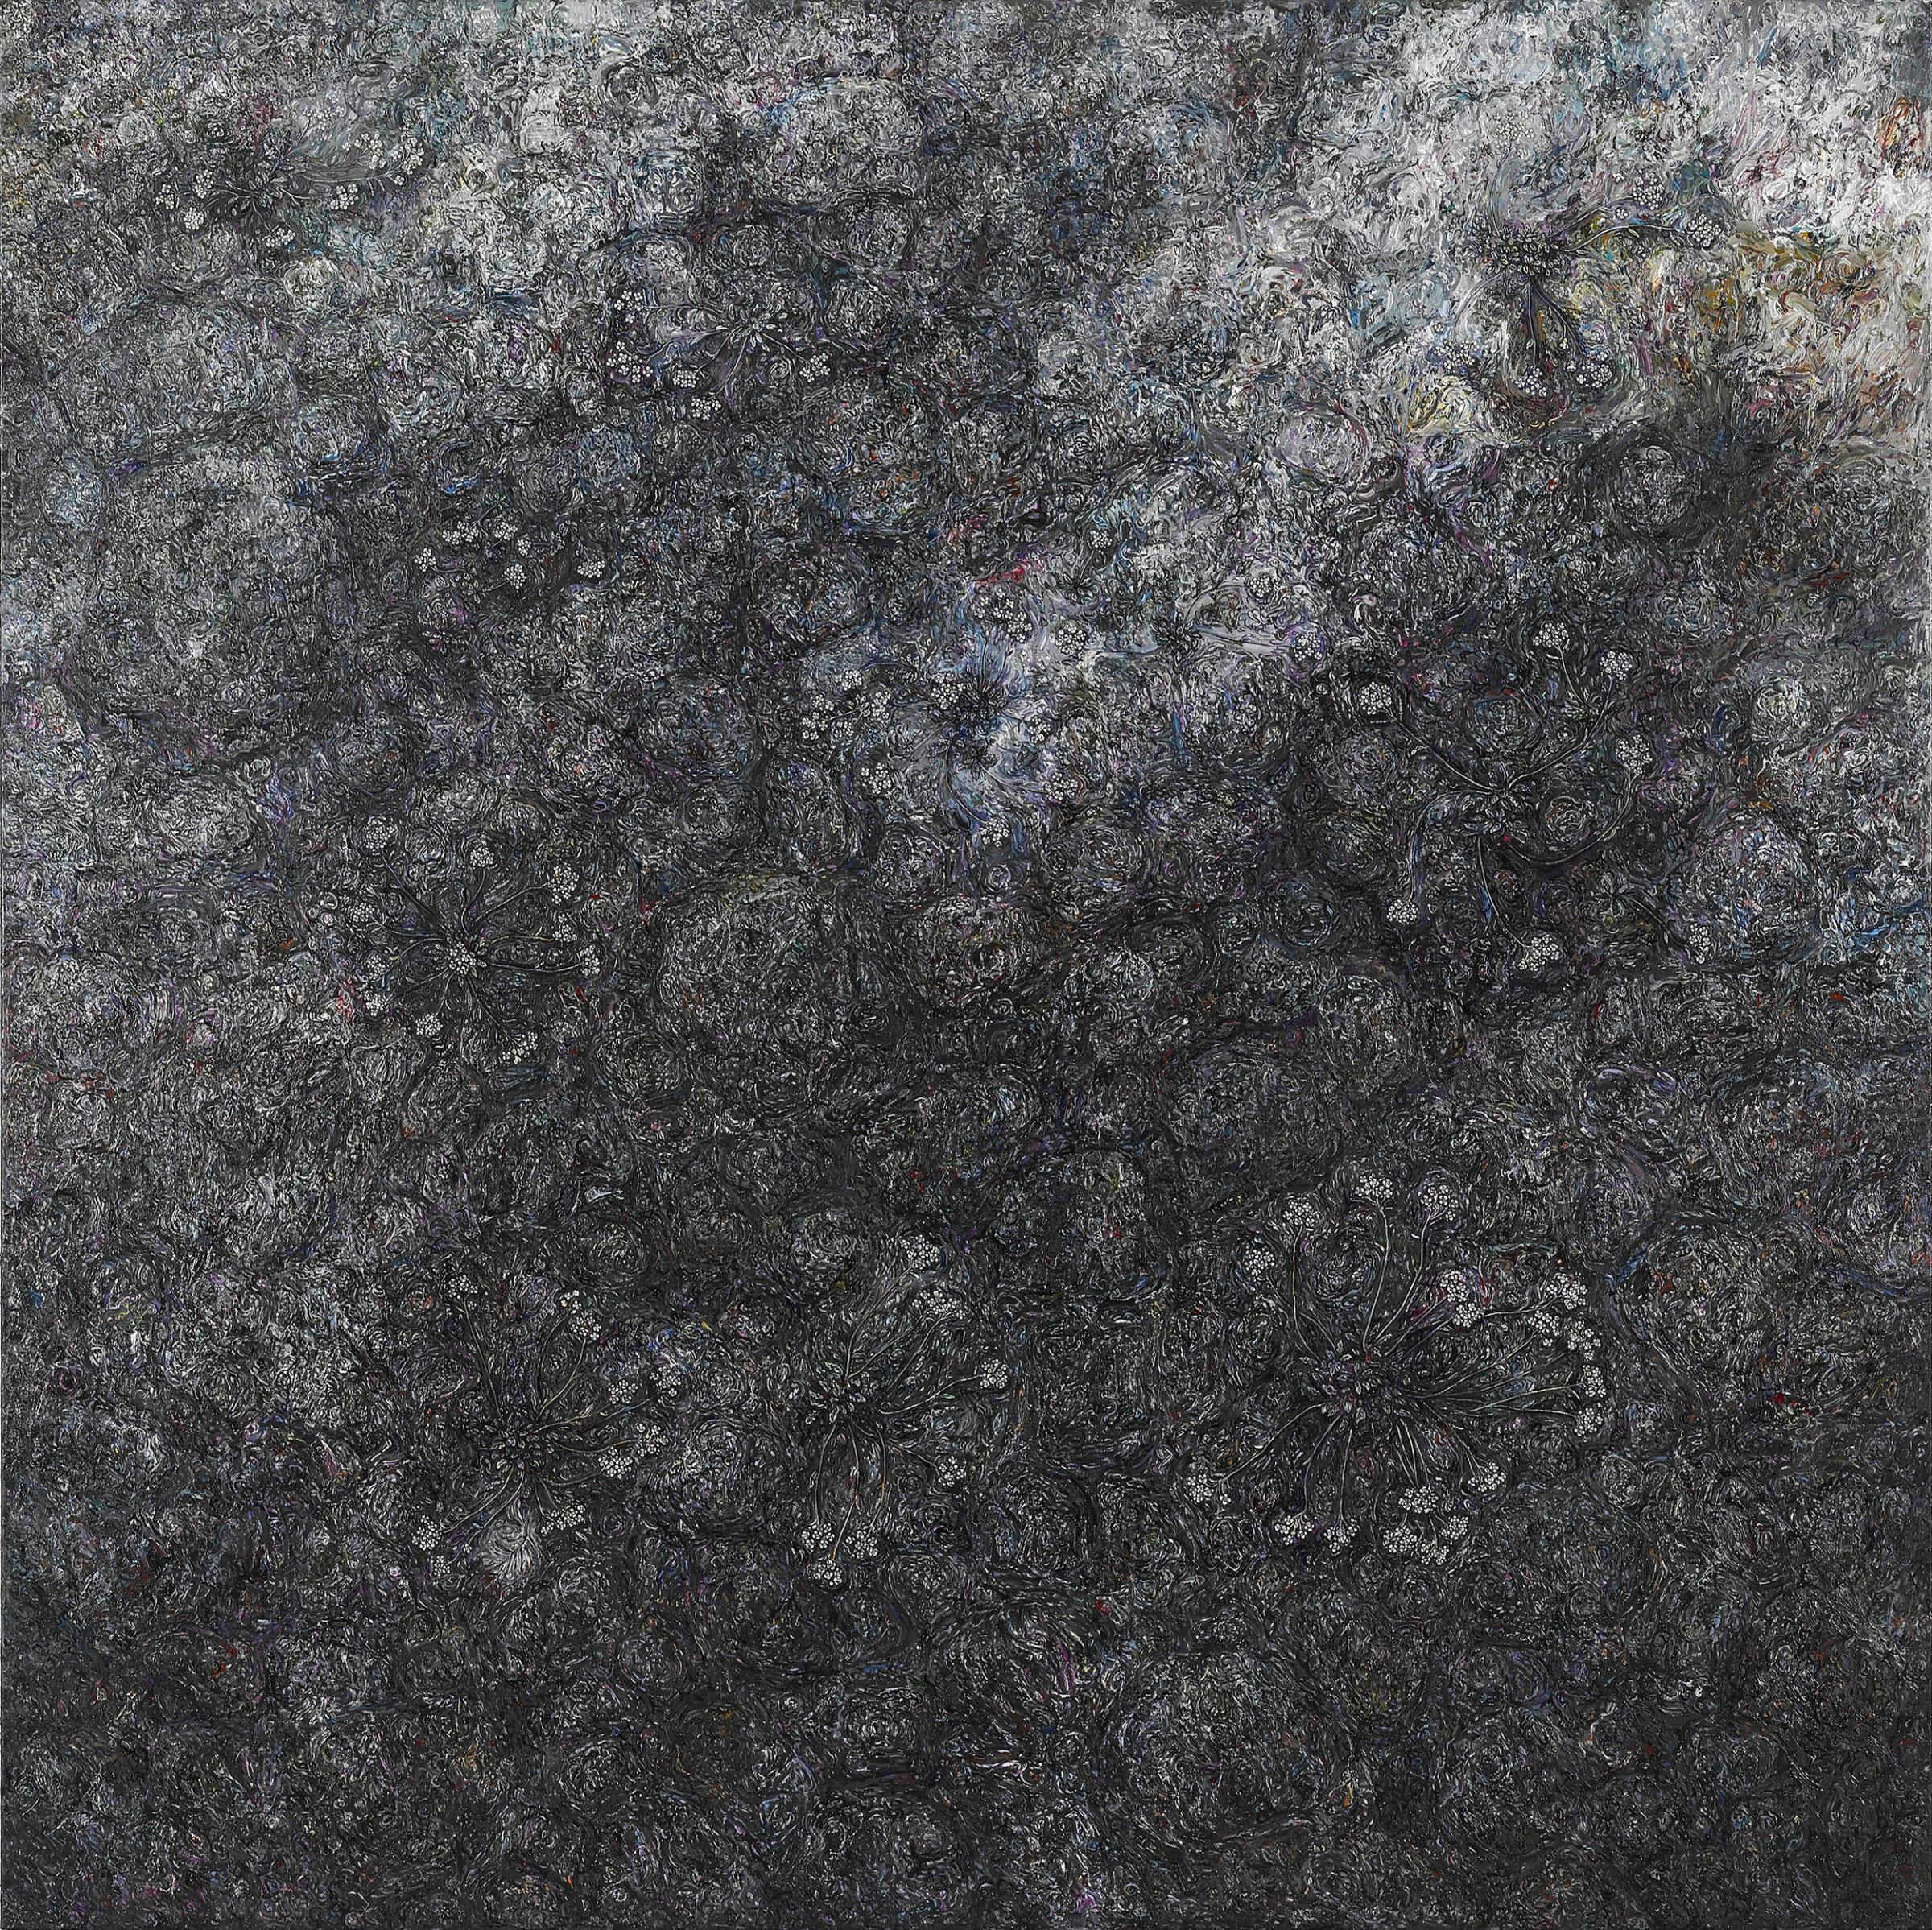 "<span class=""link fancybox-details-link""><a href=""/exhibitions/142/works/artworks10601/"">View Detail Page</a></span><div class=""artist""><strong>EGGERT PÉTURSSON</strong></div><div class=""title"">Untitled, 2011-2014</div><div class=""medium"">oil on canvas / olía á striga</div><div class=""dimensions"">150.0 x 150.0 cm<br>59 x 59 in</div>"